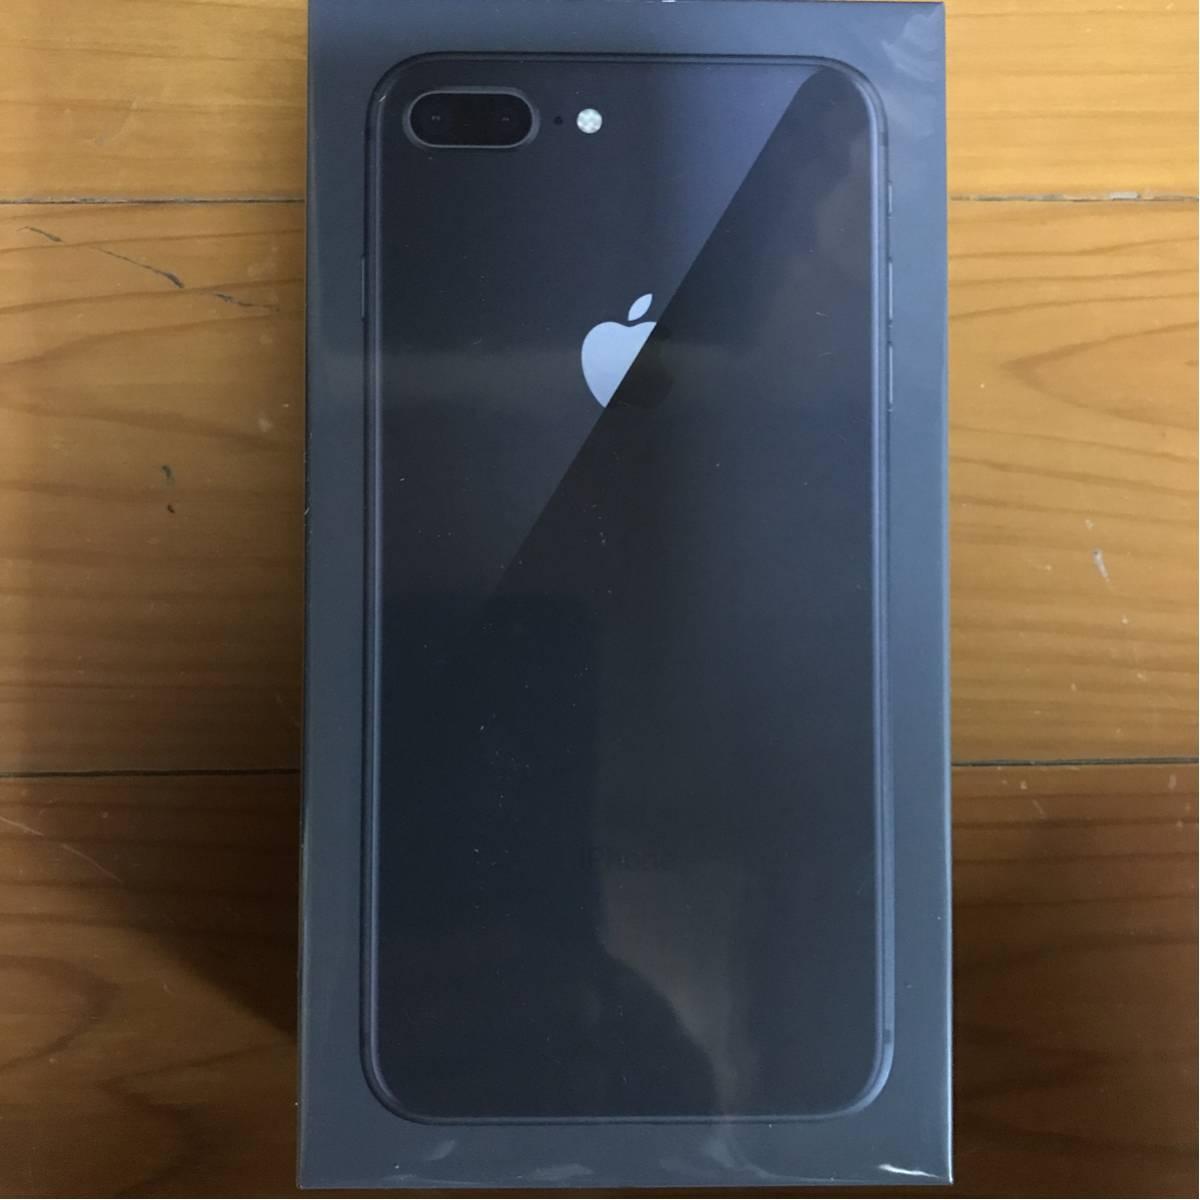 Apple iPhone8 Plus スペースグレイ 256GB SIMフリー